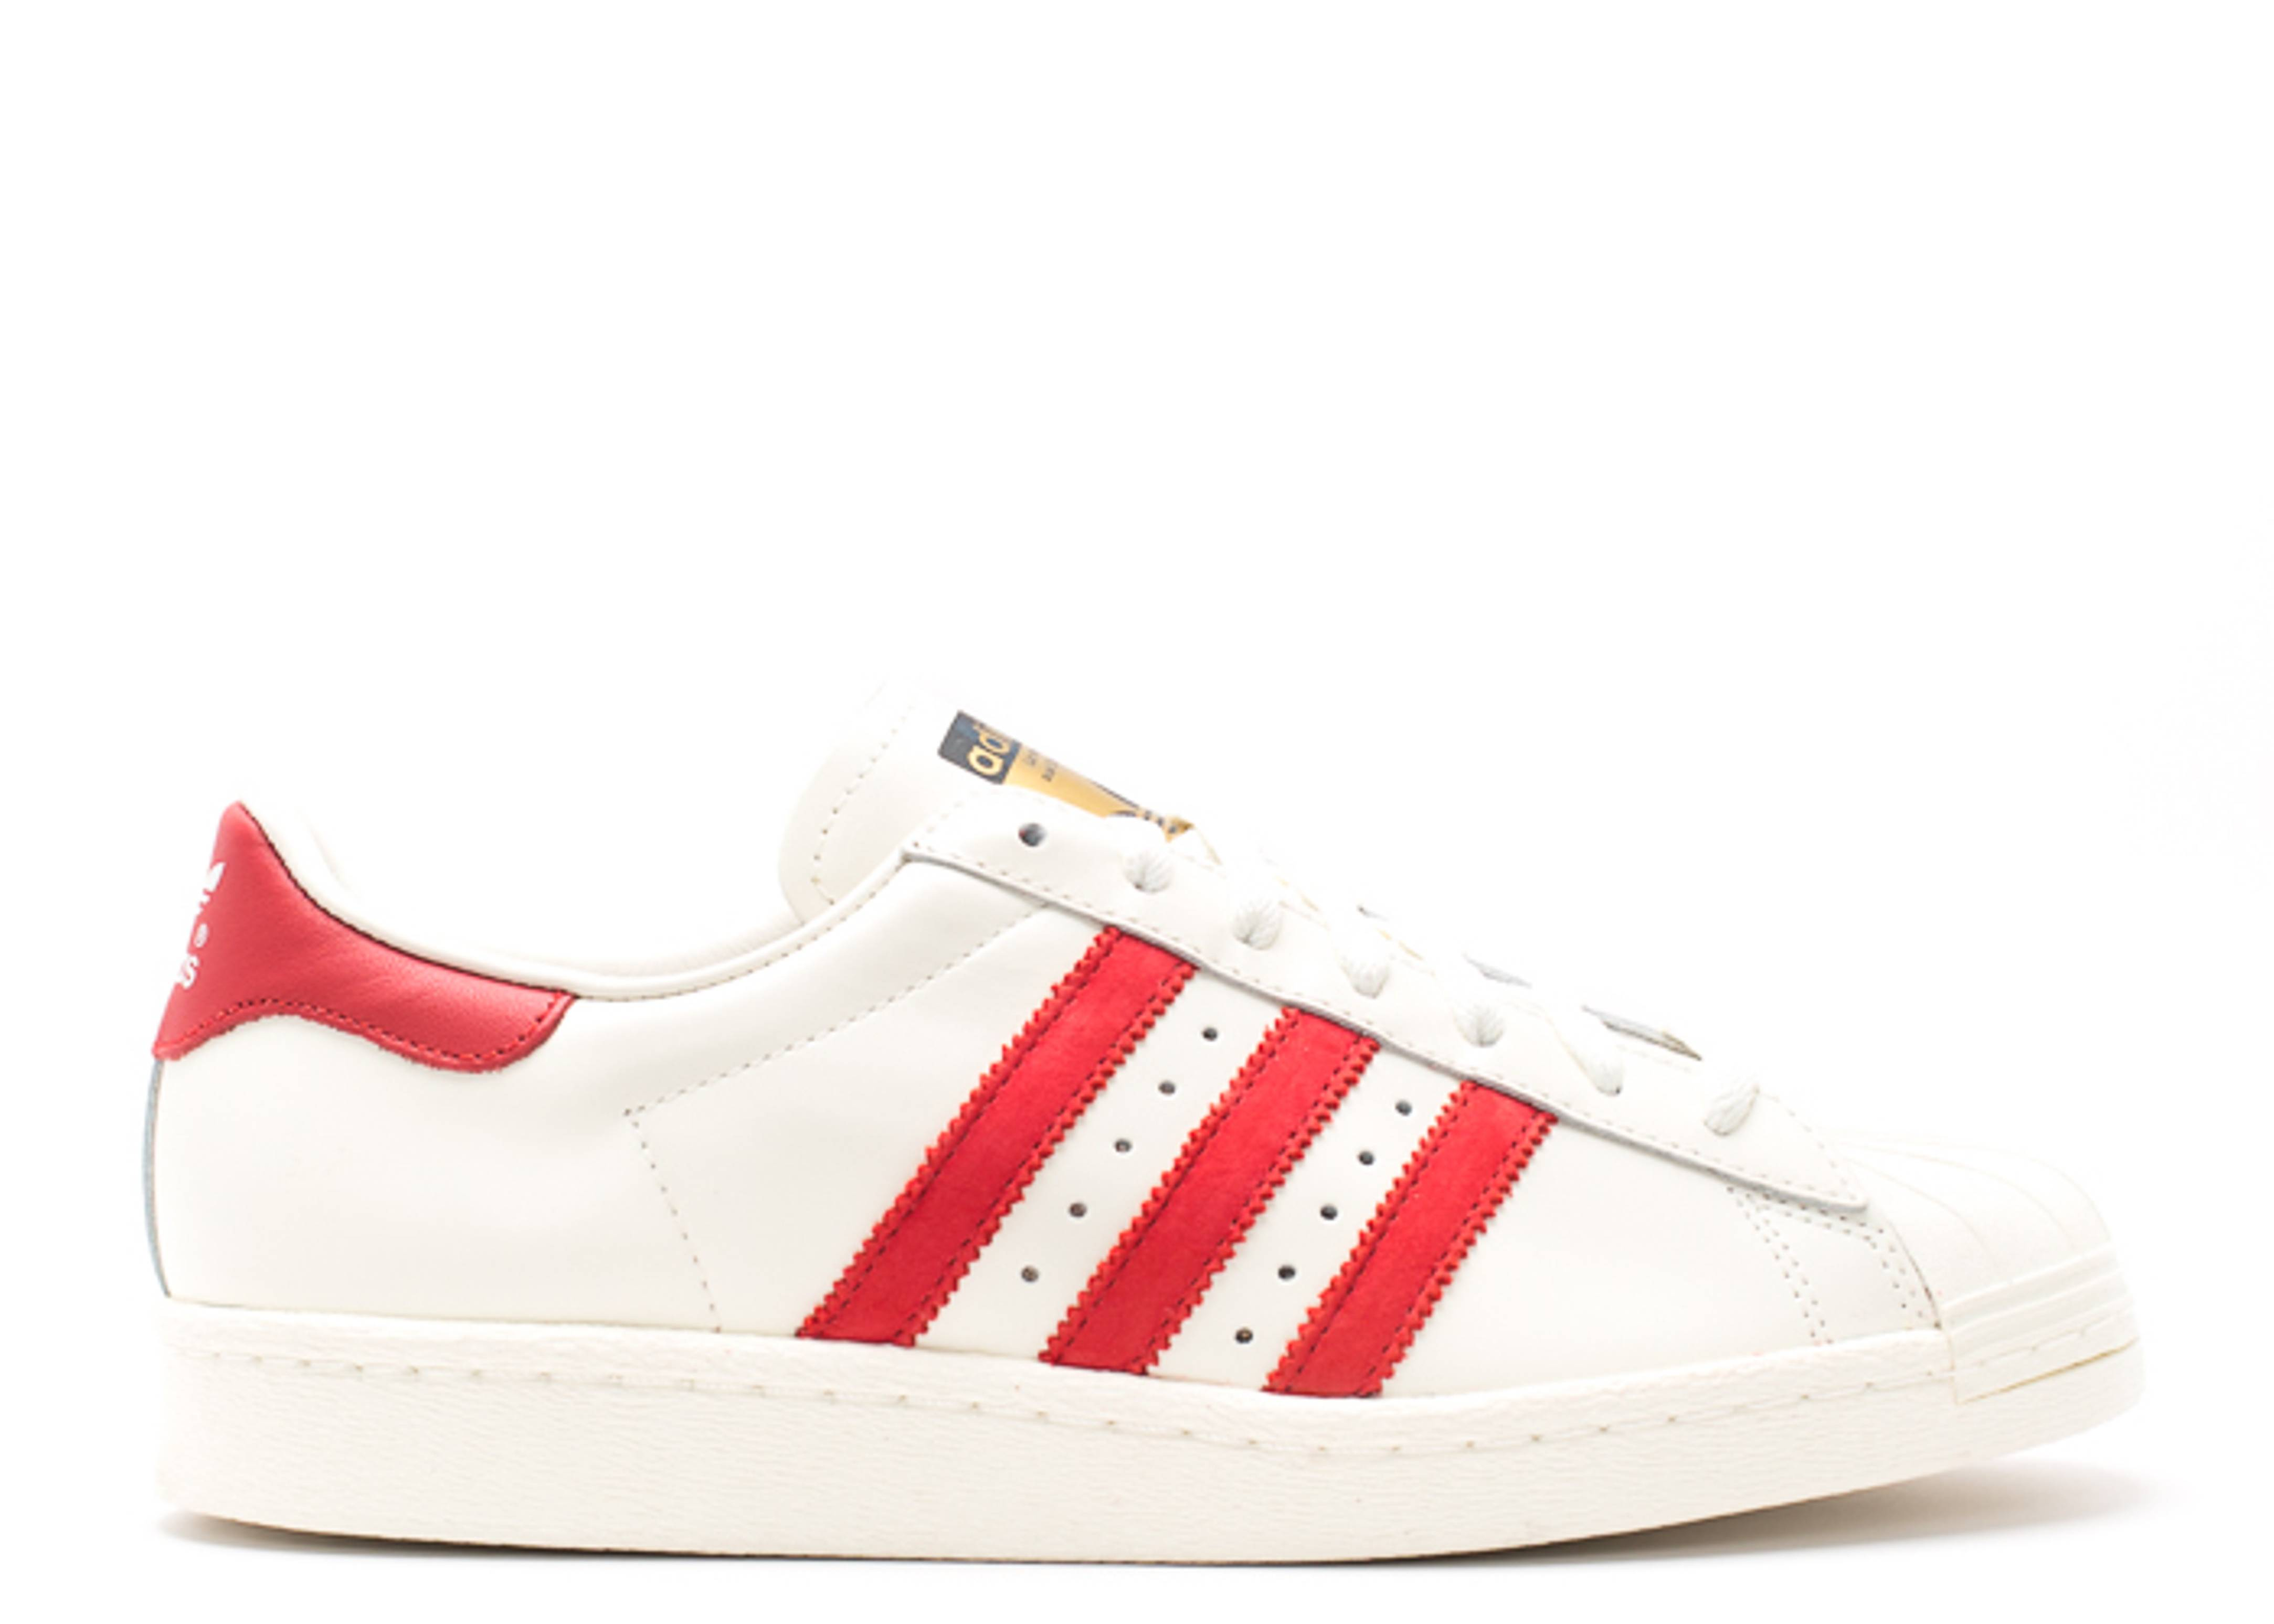 Adidas Superstar 80s DLX | Heels up | Adidas superstar